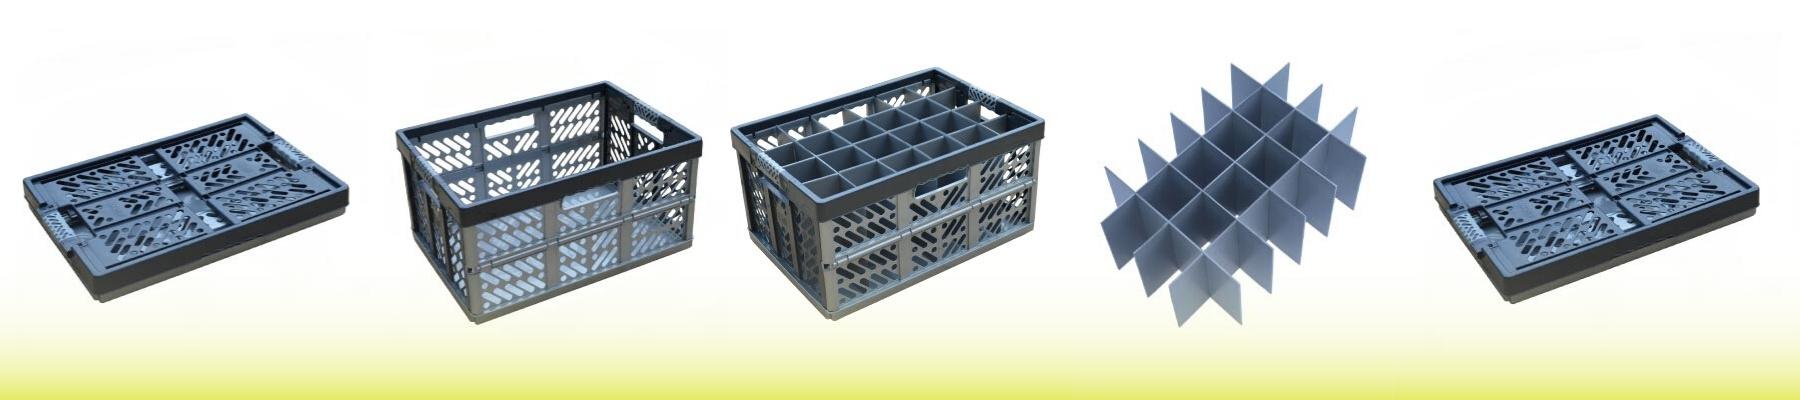 Folding Glass Storage Crate